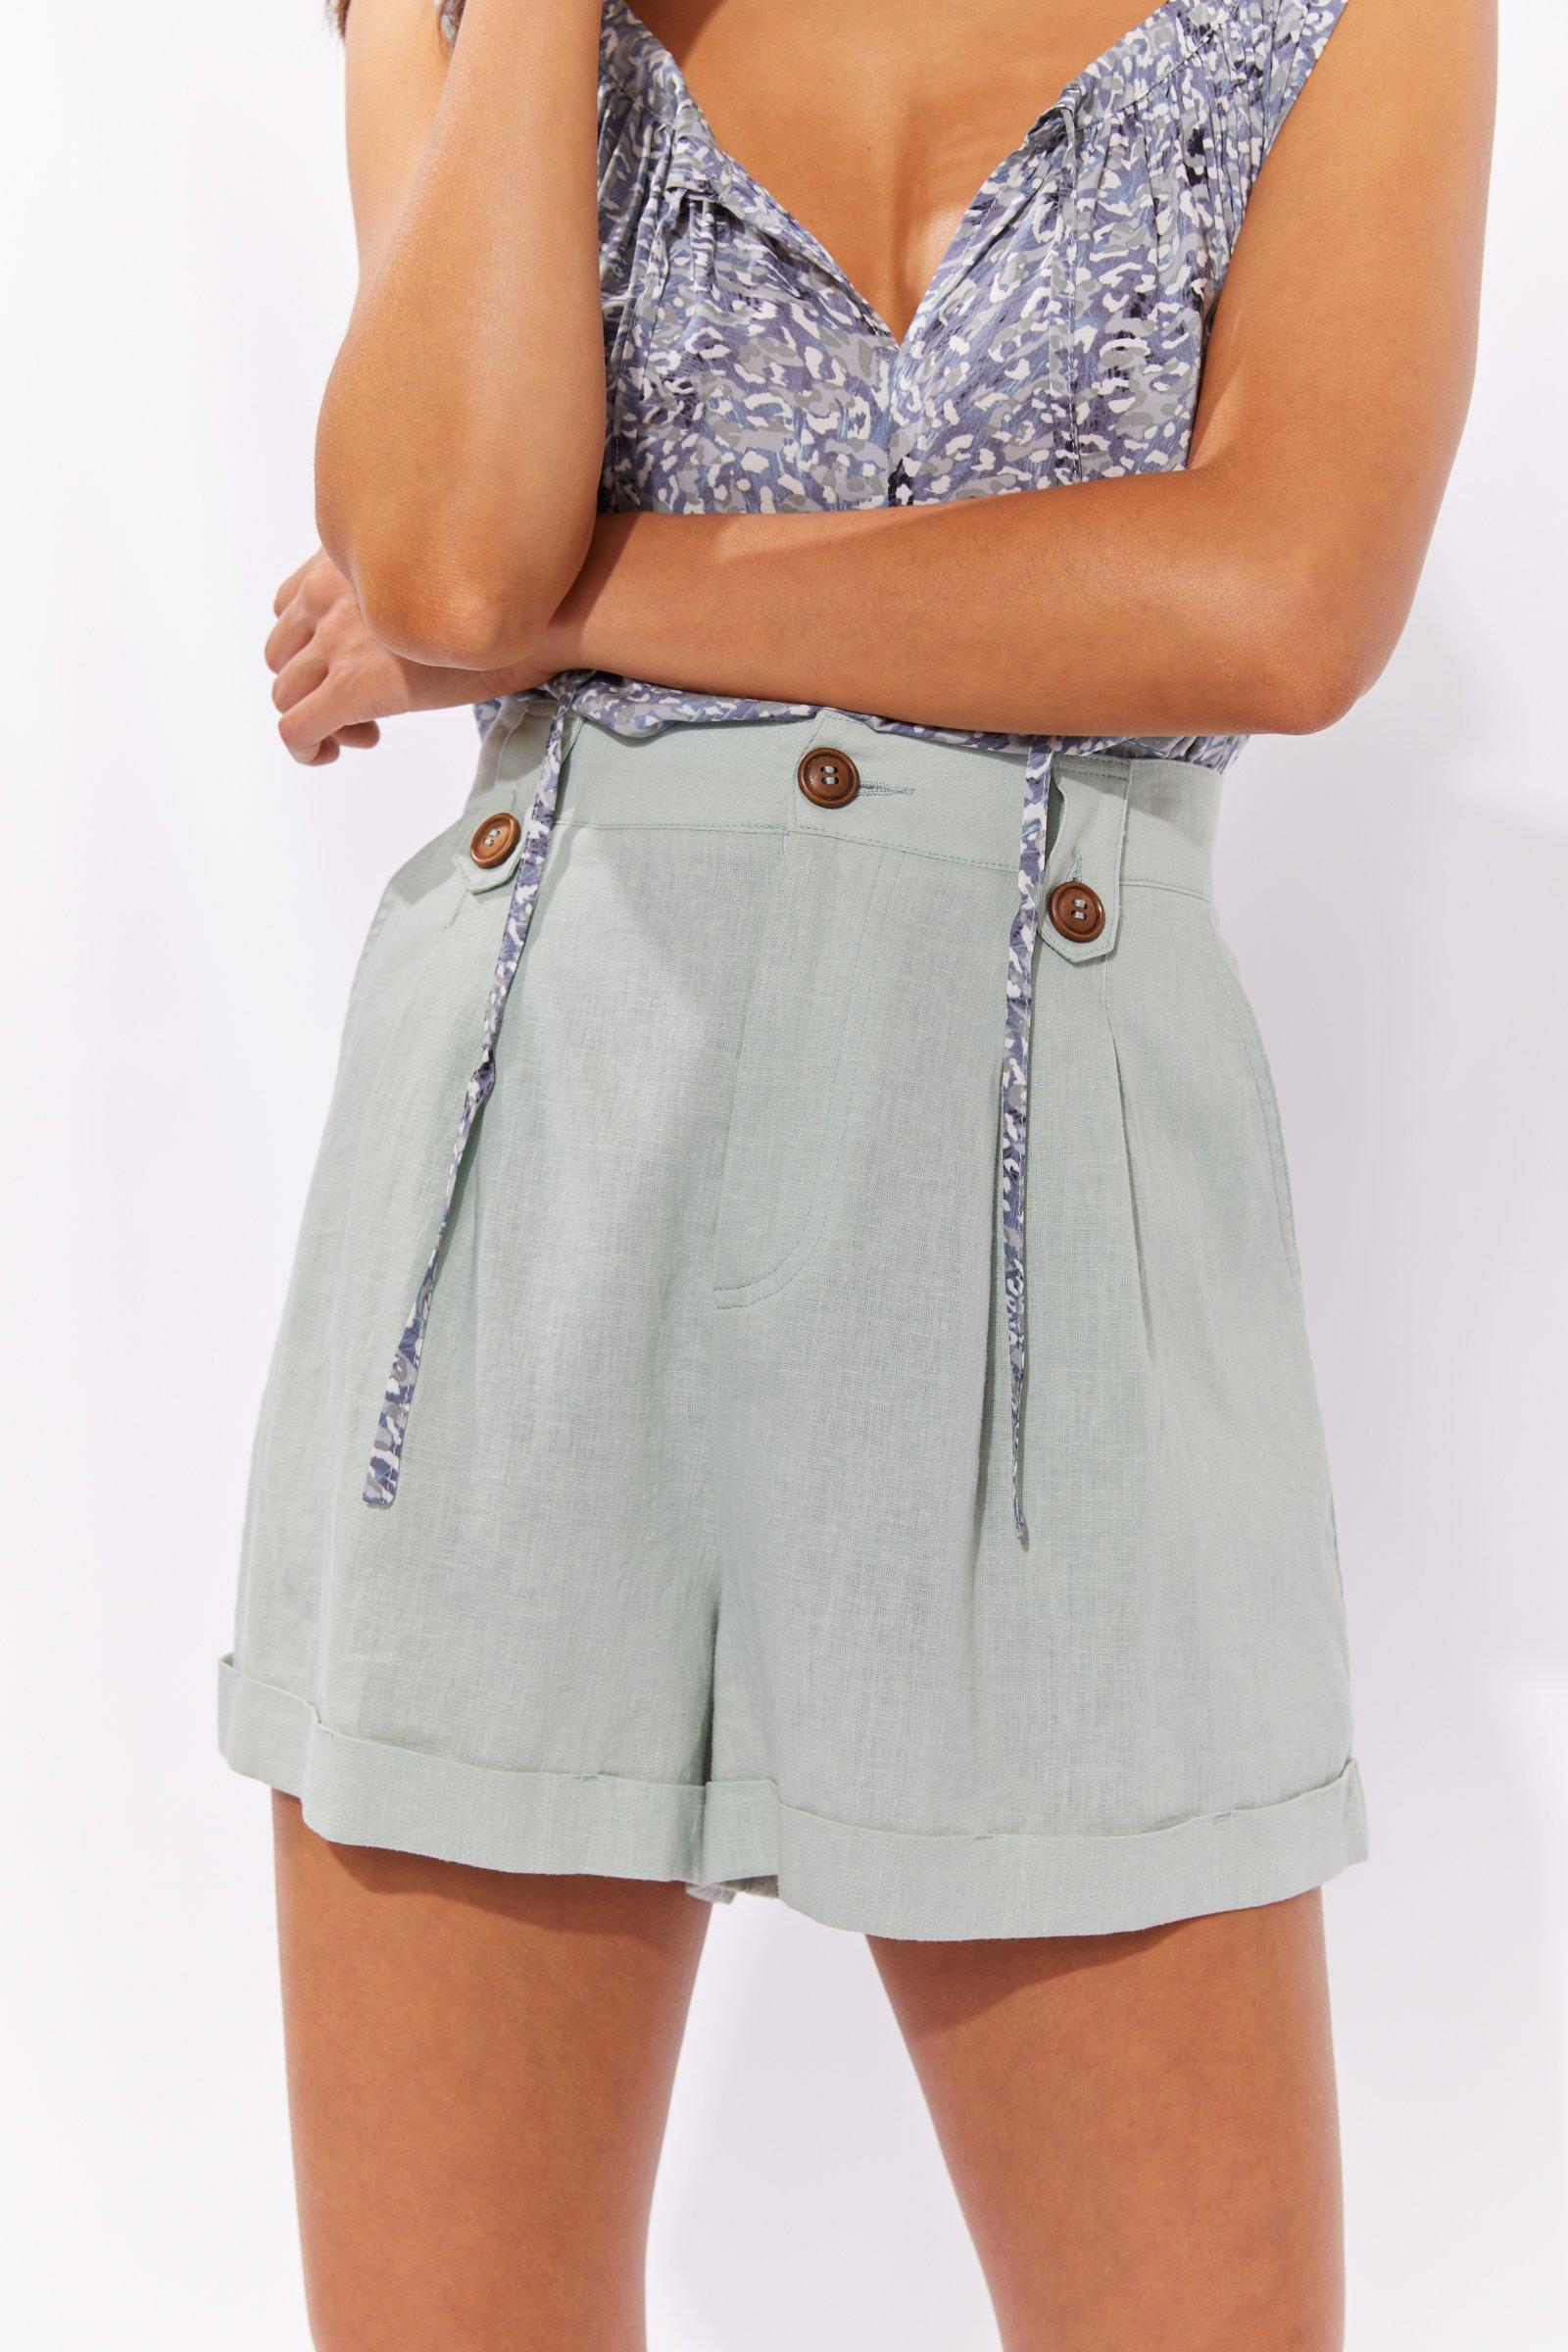 Haven Cuban Shorts - Mint